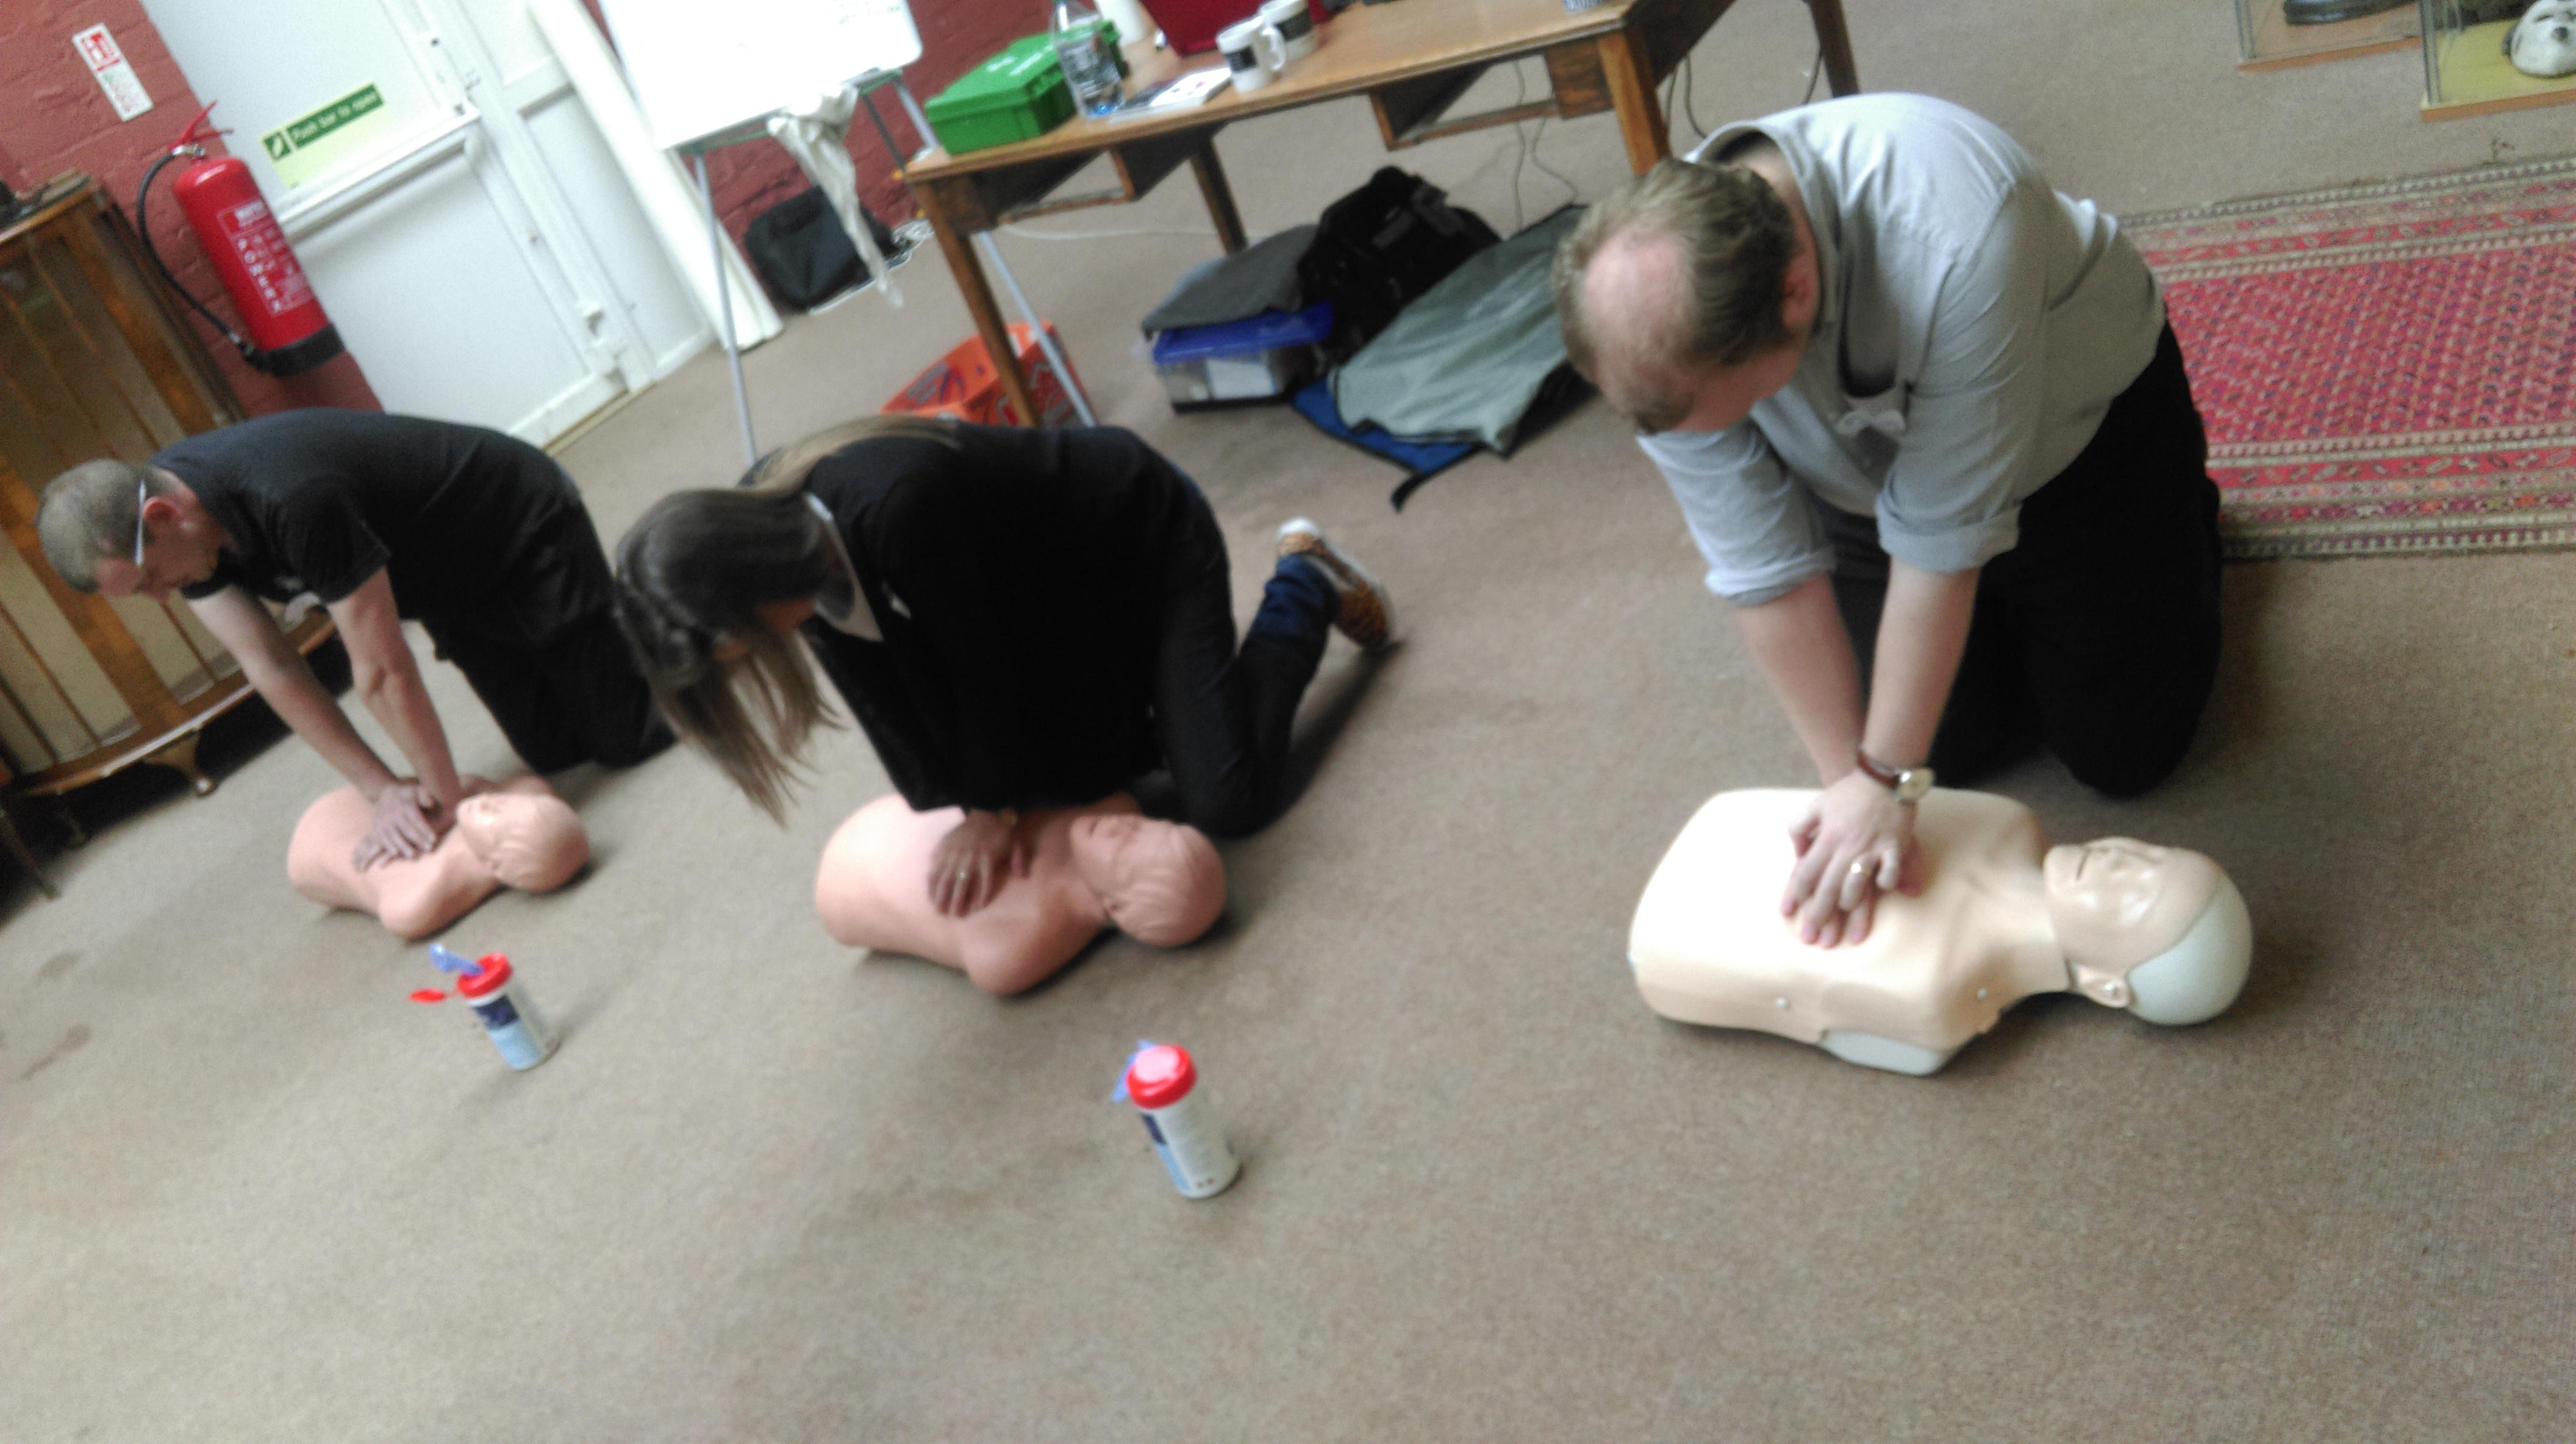 CPR emergency procedure